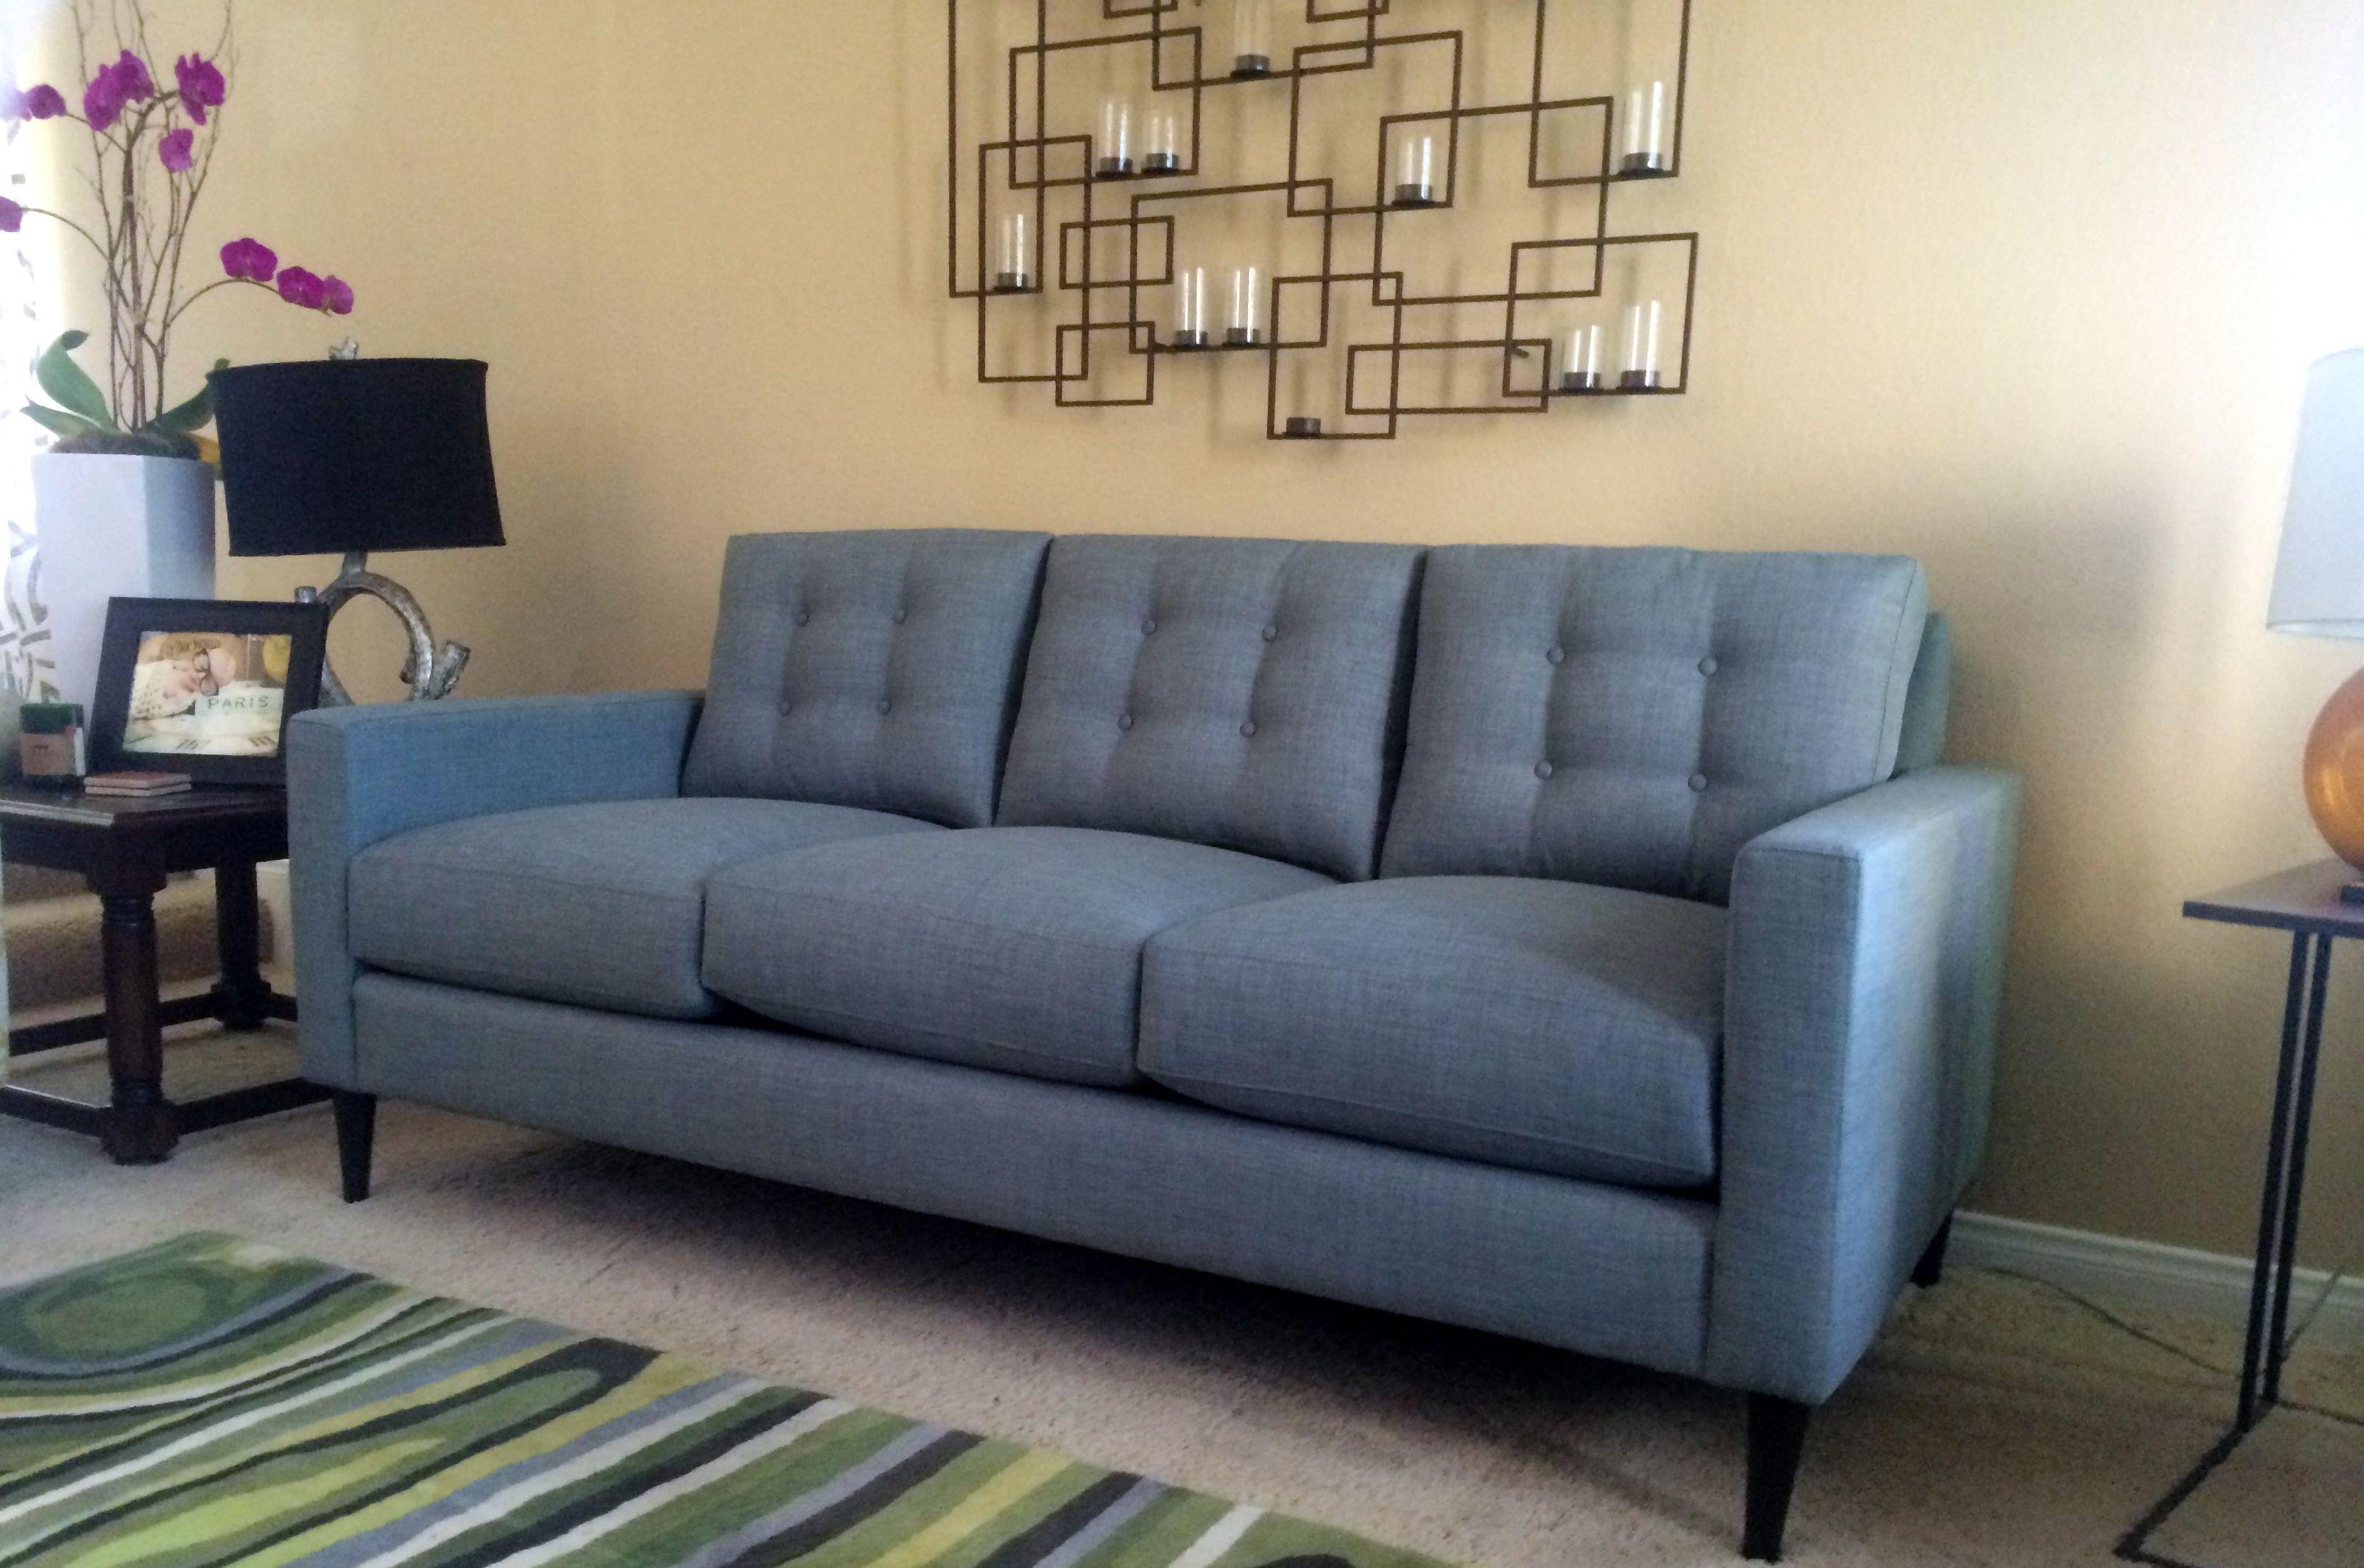 Leather Sleeper Sofa Custom sofa or sectional Leather or fabric Ships Nationwide Showrooms